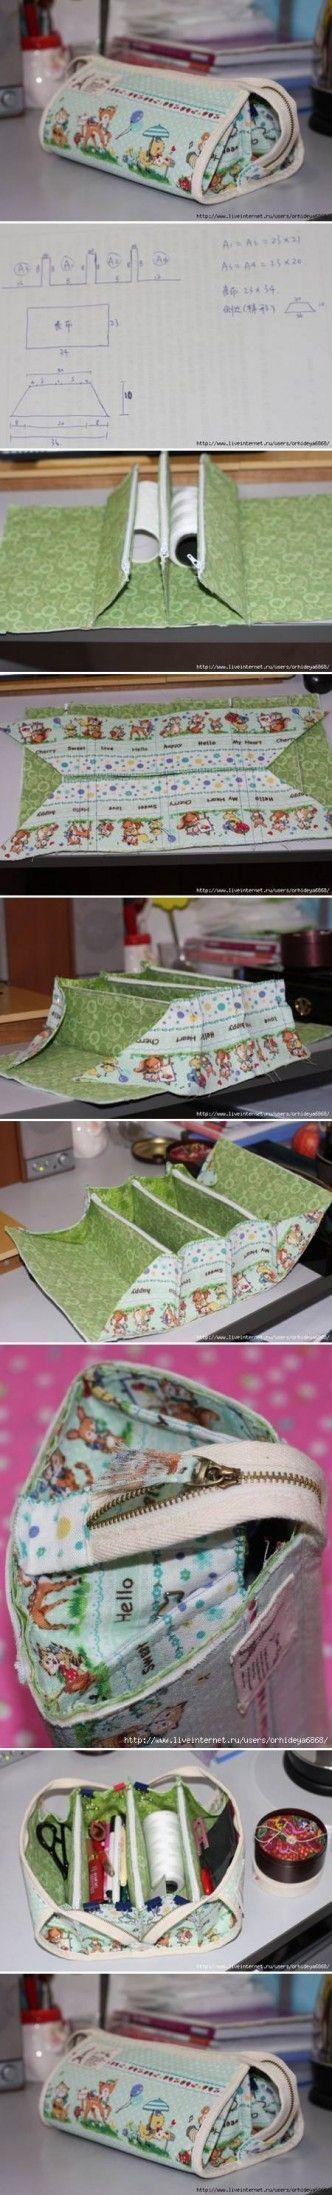 DIY Handbag for Needlework DIY Projects